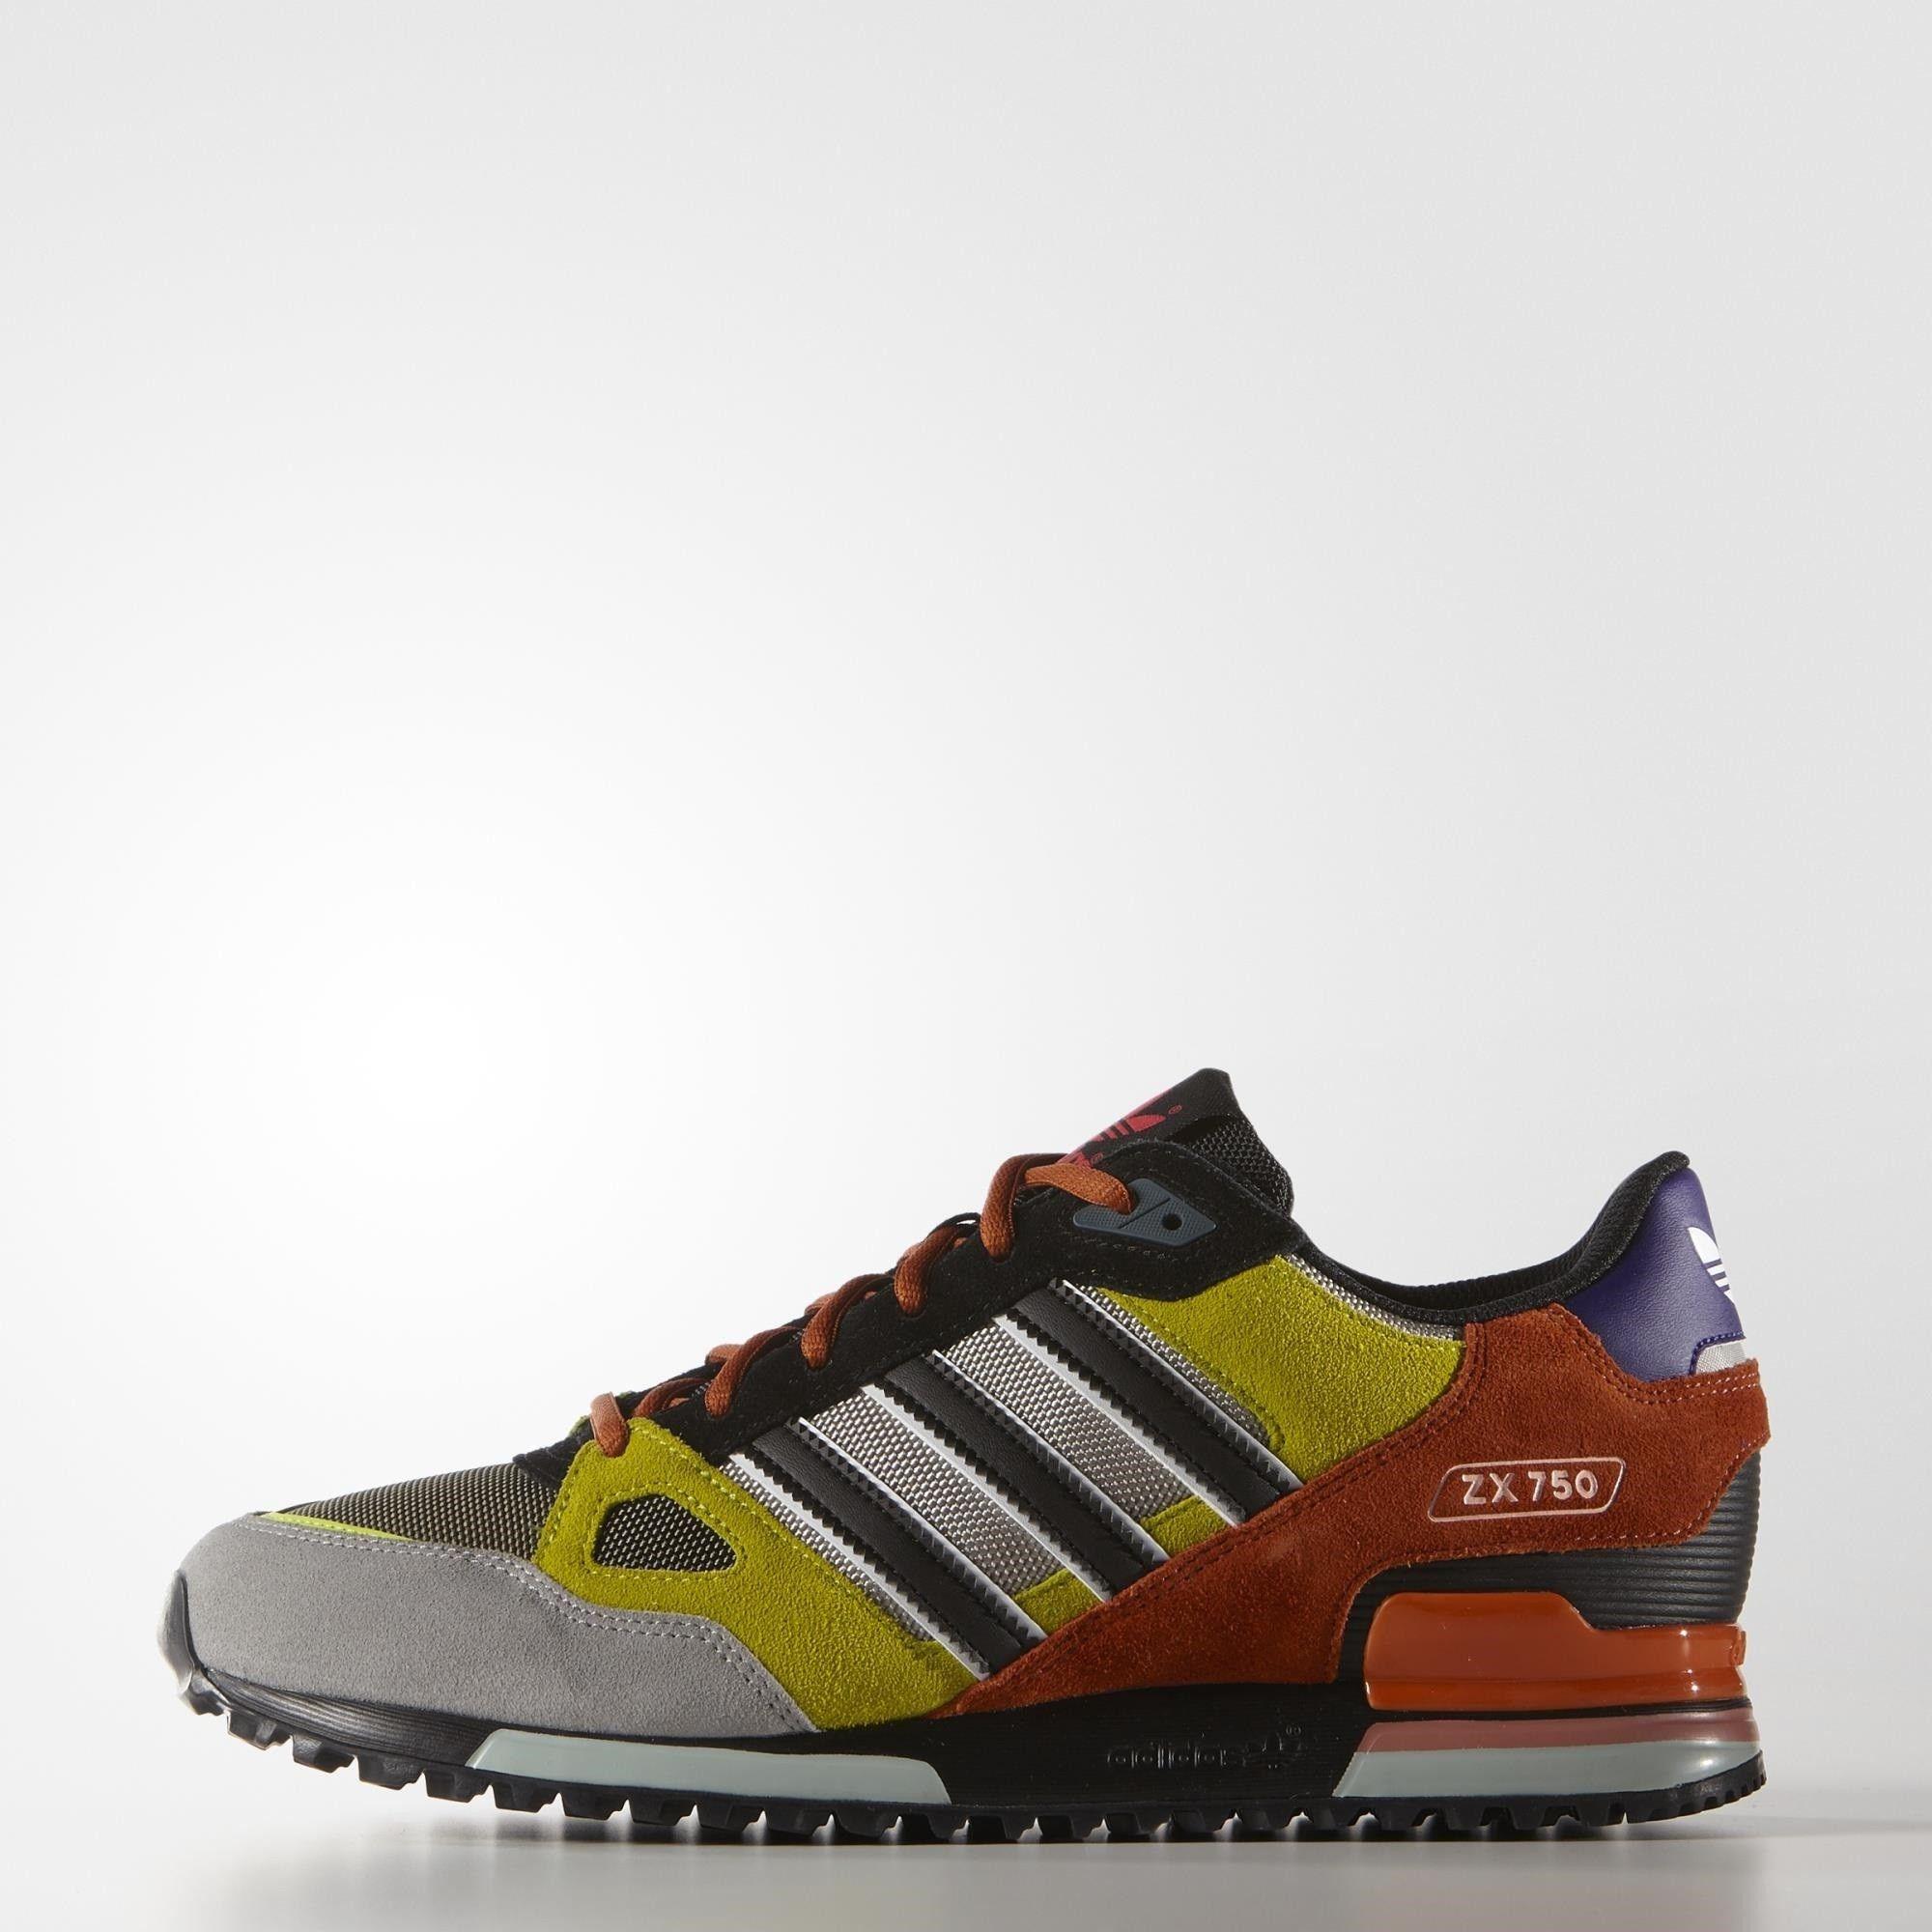 low priced 2ccd7 5cf43 Adidas Men's Originals ZX 750 Shoes | GJSportLand | Adidas ...